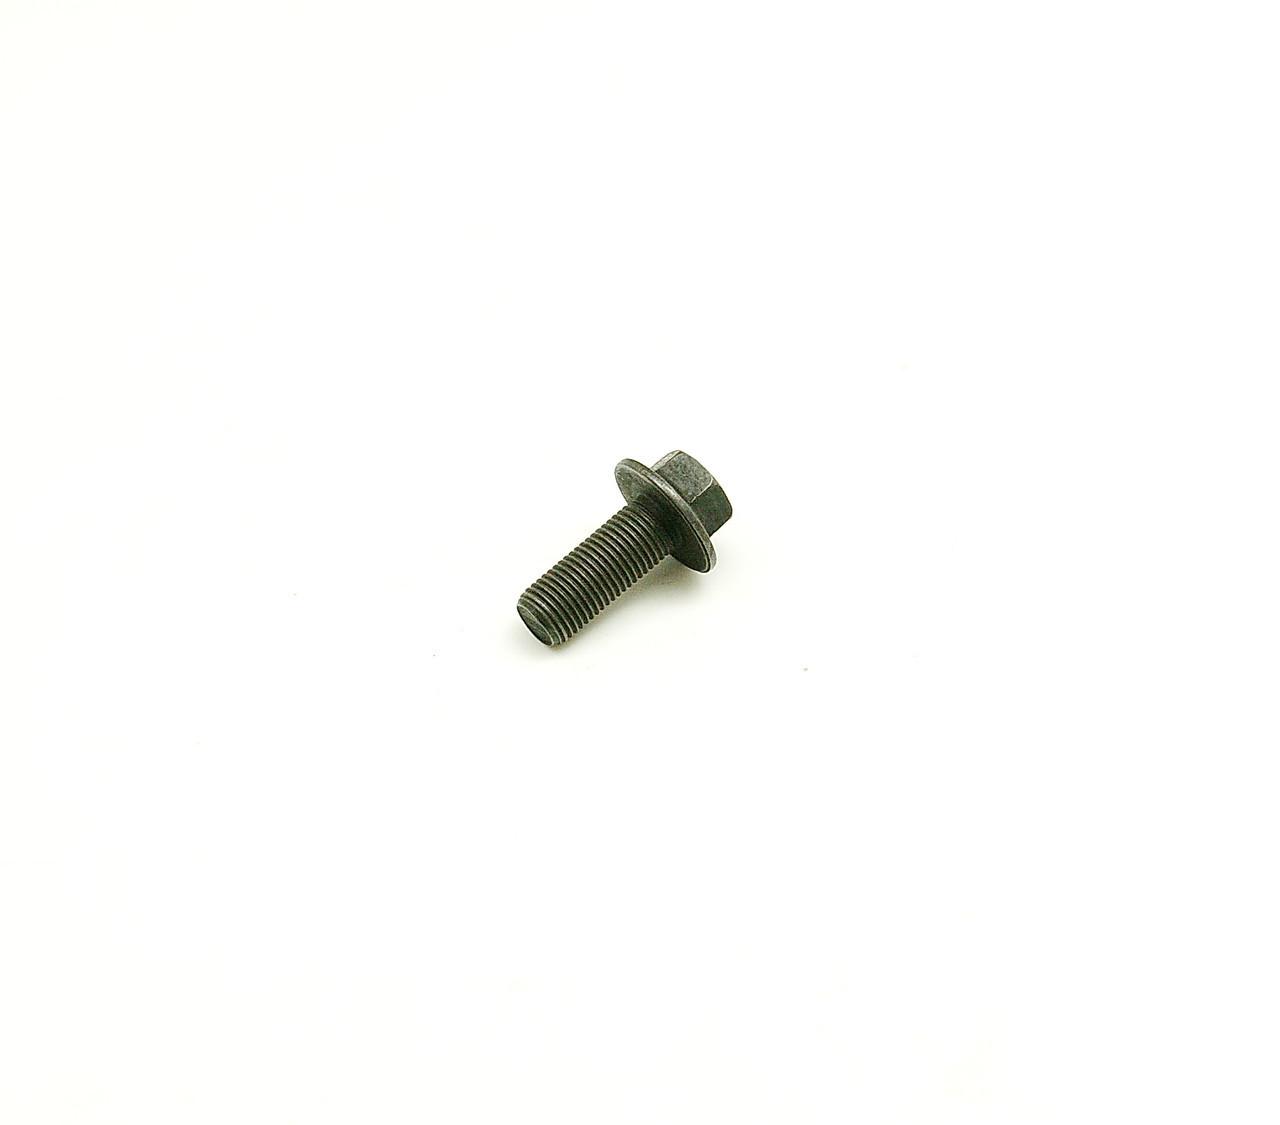 Болт крепления демпфера (M14x1.50x35) Cummins ISLe  3906733